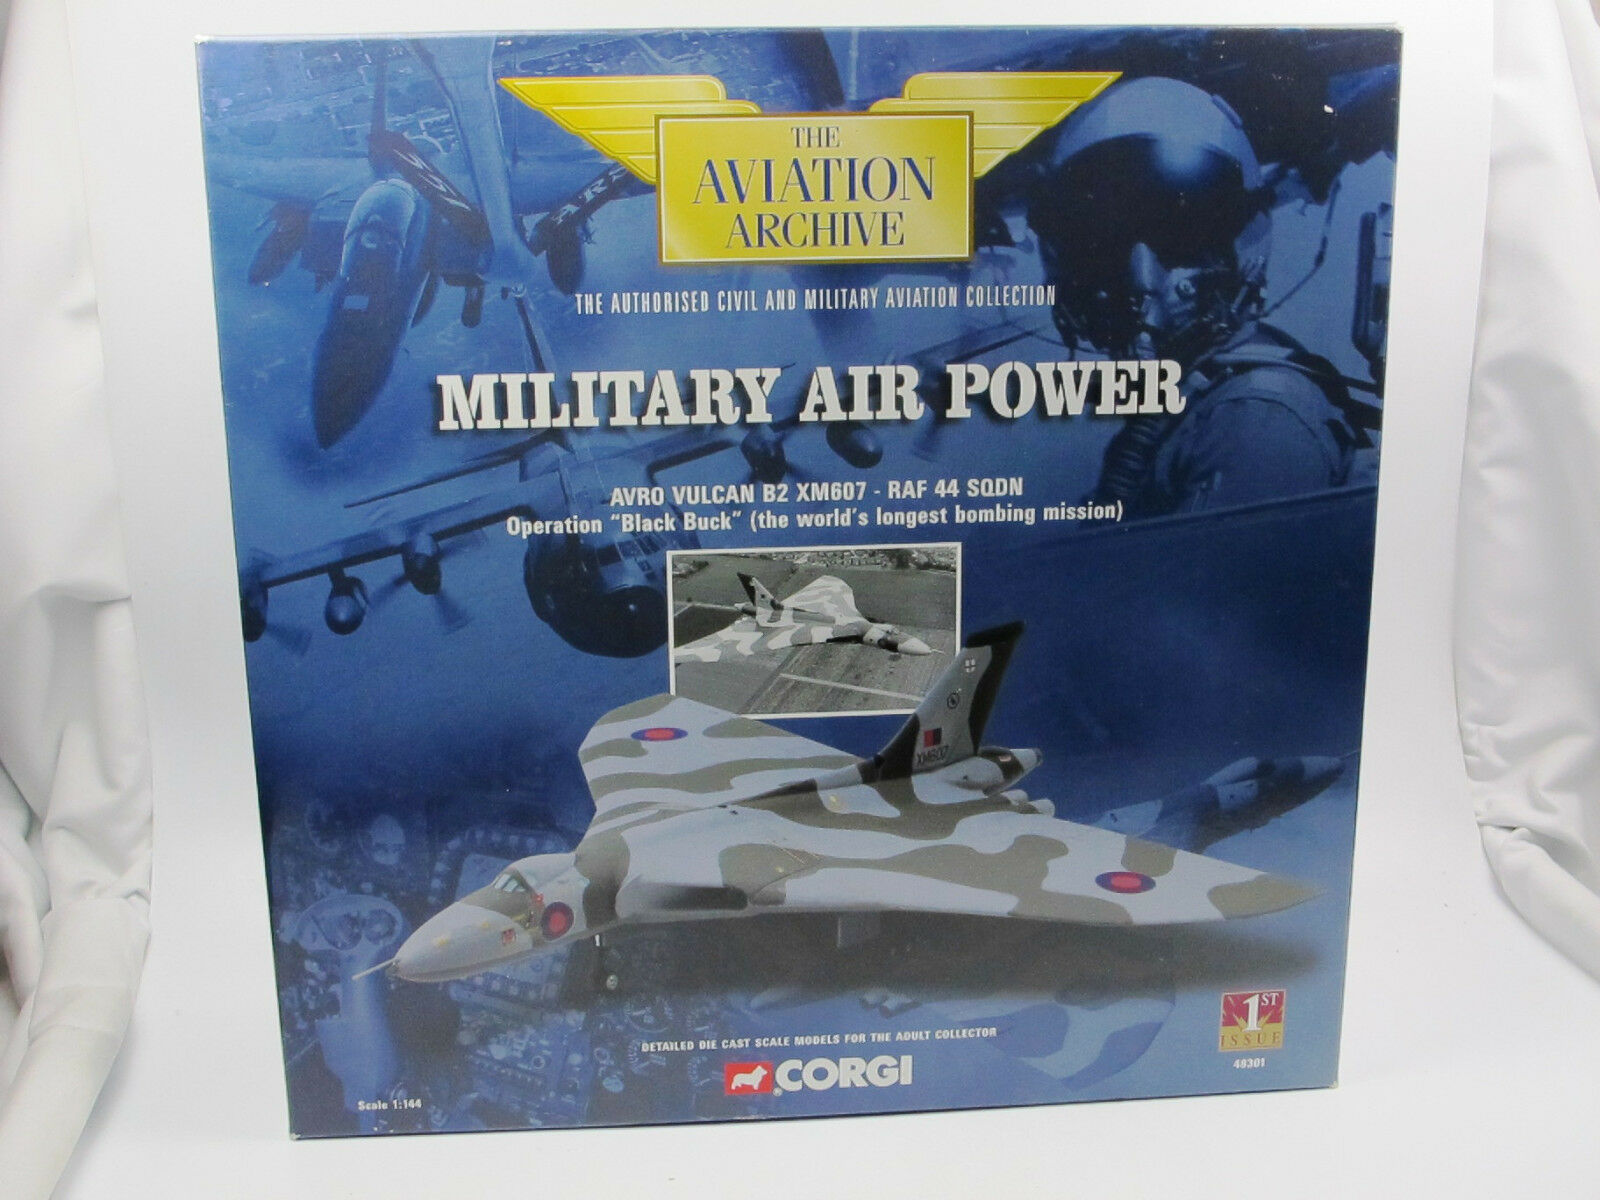 Corgi 48301-Avro Vulcan b2 xm607-raf 44 Sqdn-Operación nero Buck 1 144